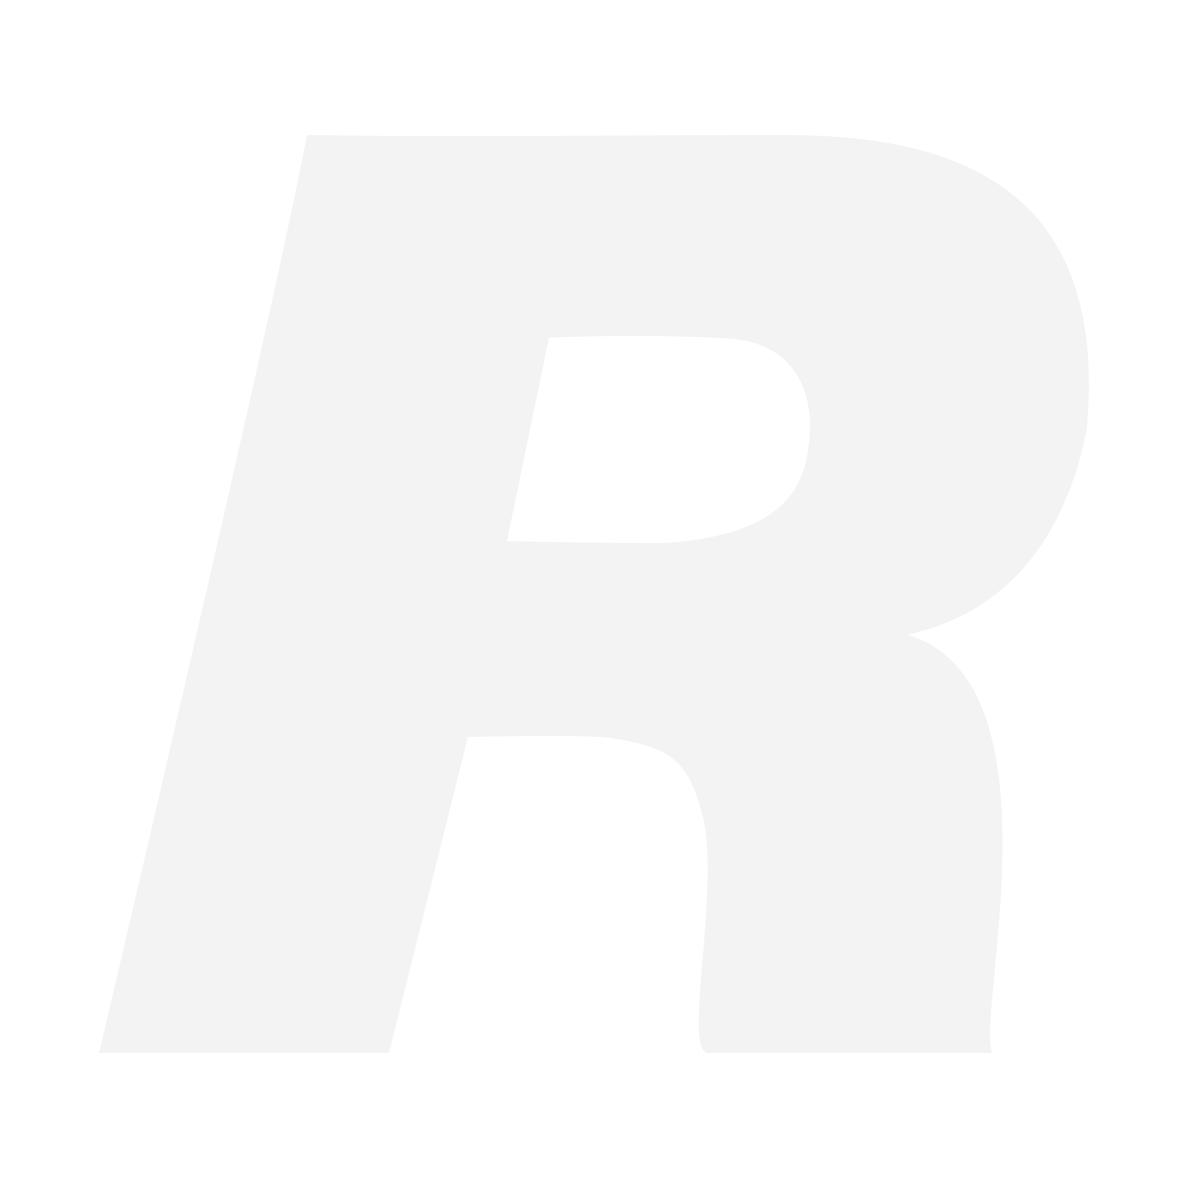 Rode PG1 Cold Shoe Pistol Grip (VideoMic, Stereo VideoMic)